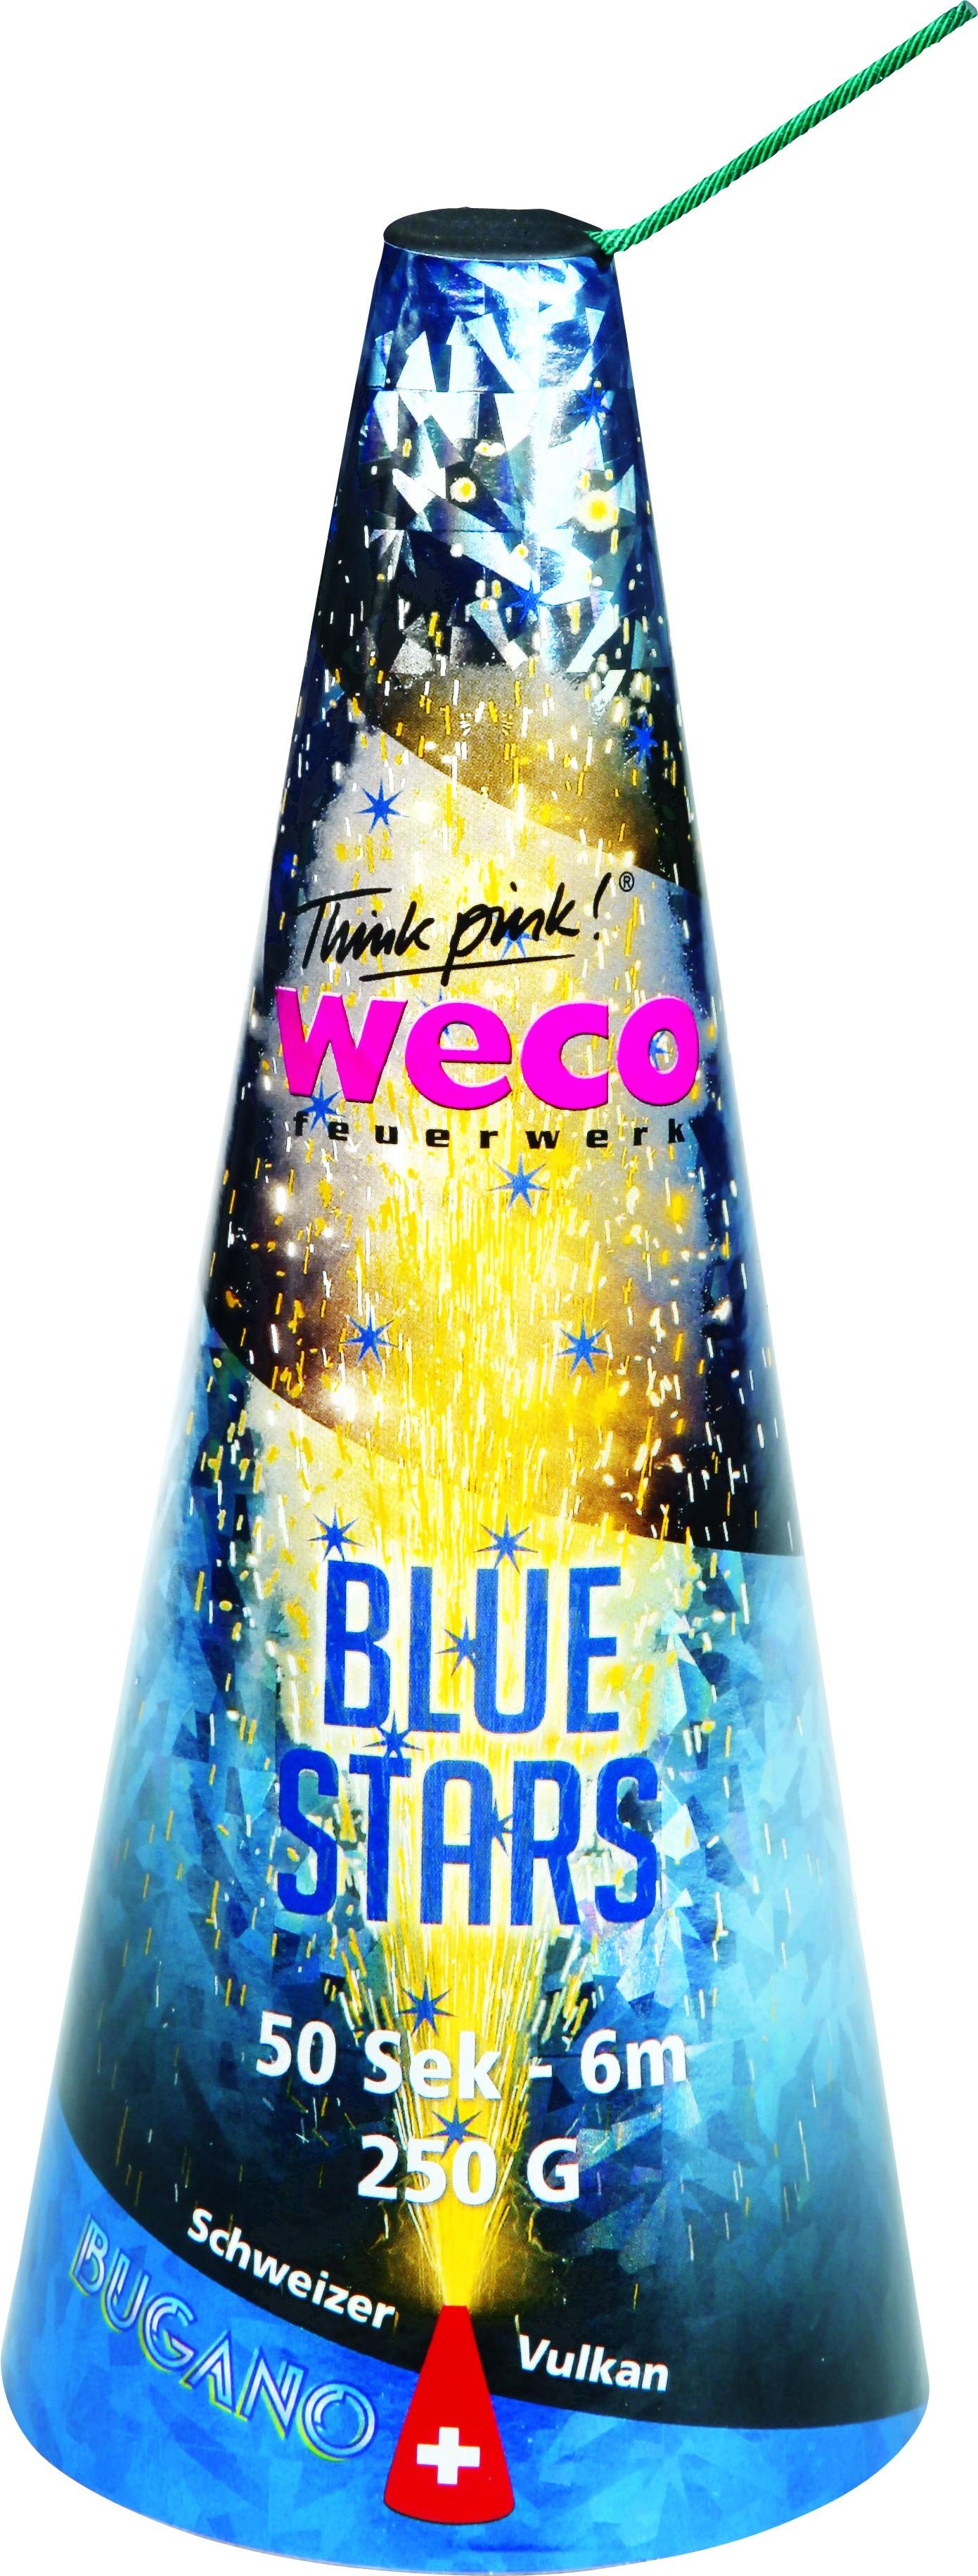 Weco Blue Stars